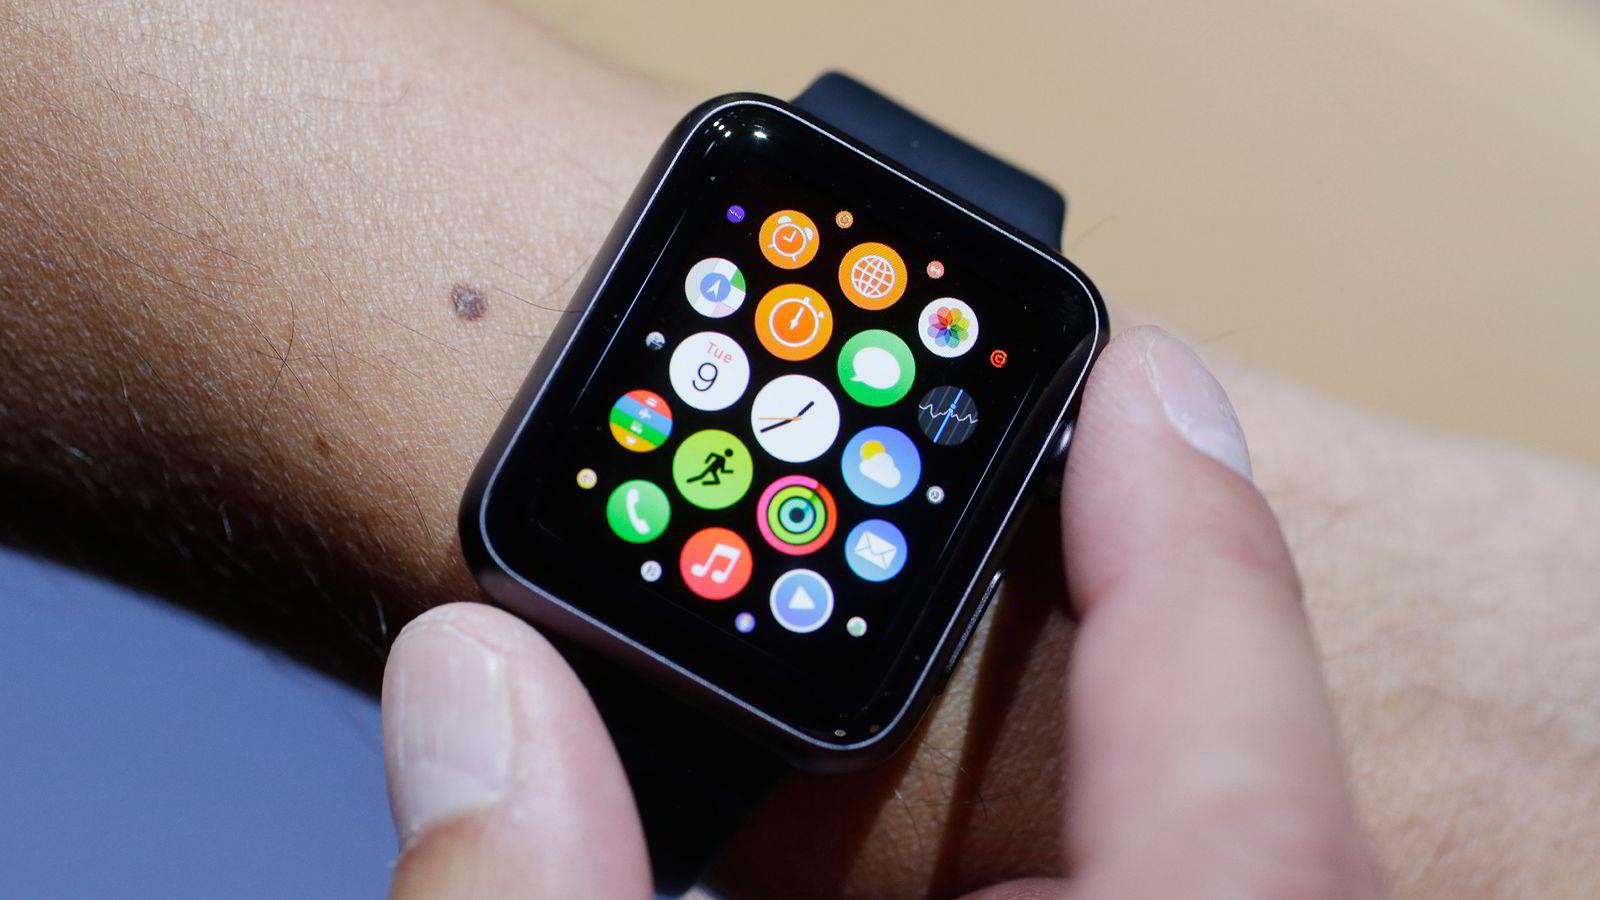 Apple Watch ble vist offentlig for første gang i San Francisco 9. mars 2015. Foto: NTB Scanpix/AP Photo/Marcio Jose Sanchez